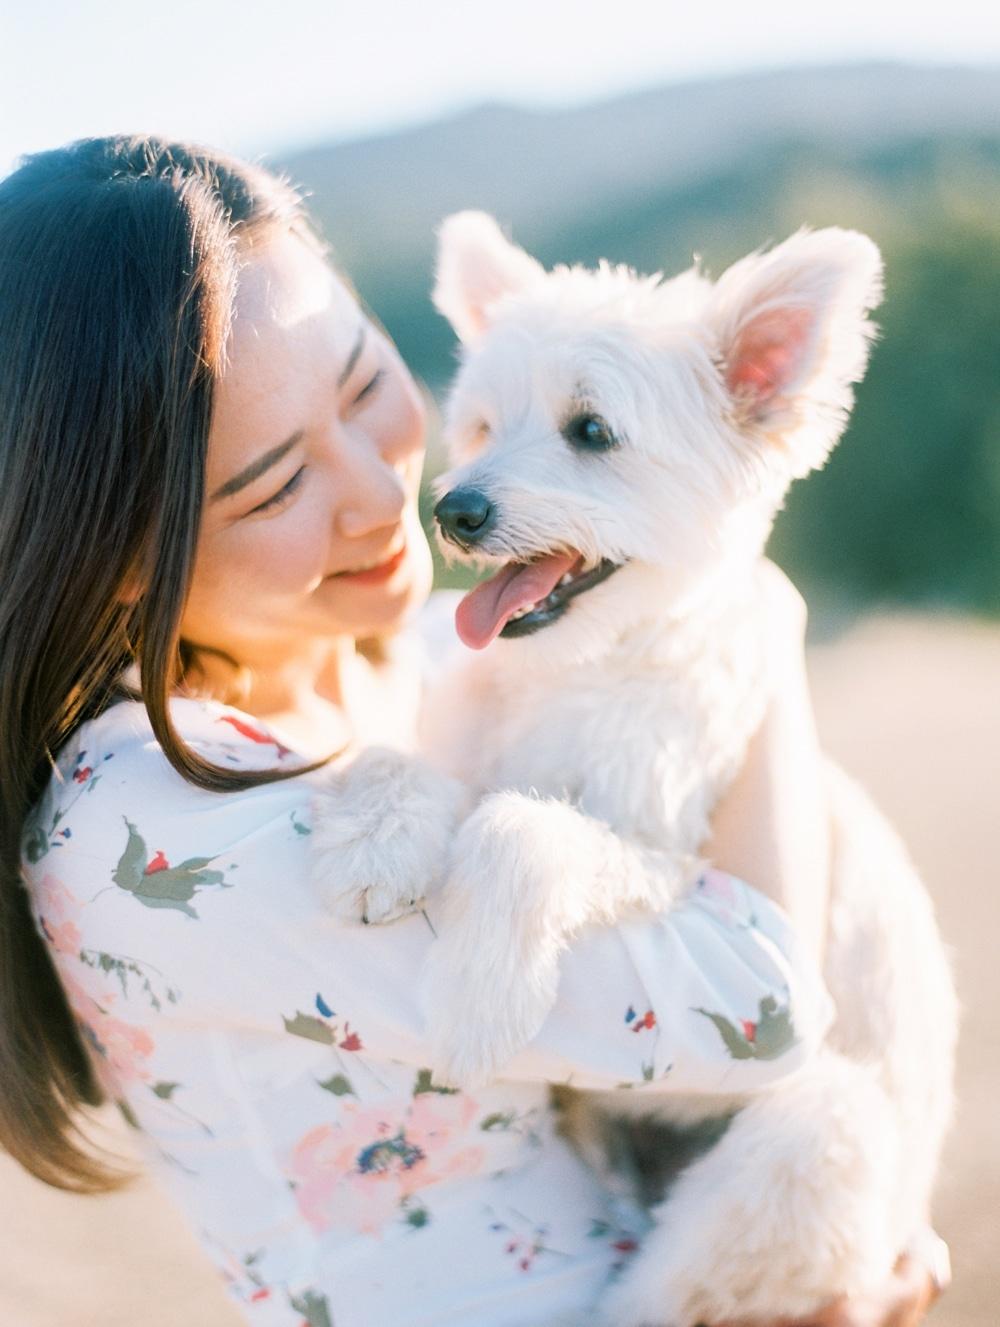 Kristin-La-Voie-Photography-california-wedding-photographer-dog-session-rancho-san-antonio-los-altos-22